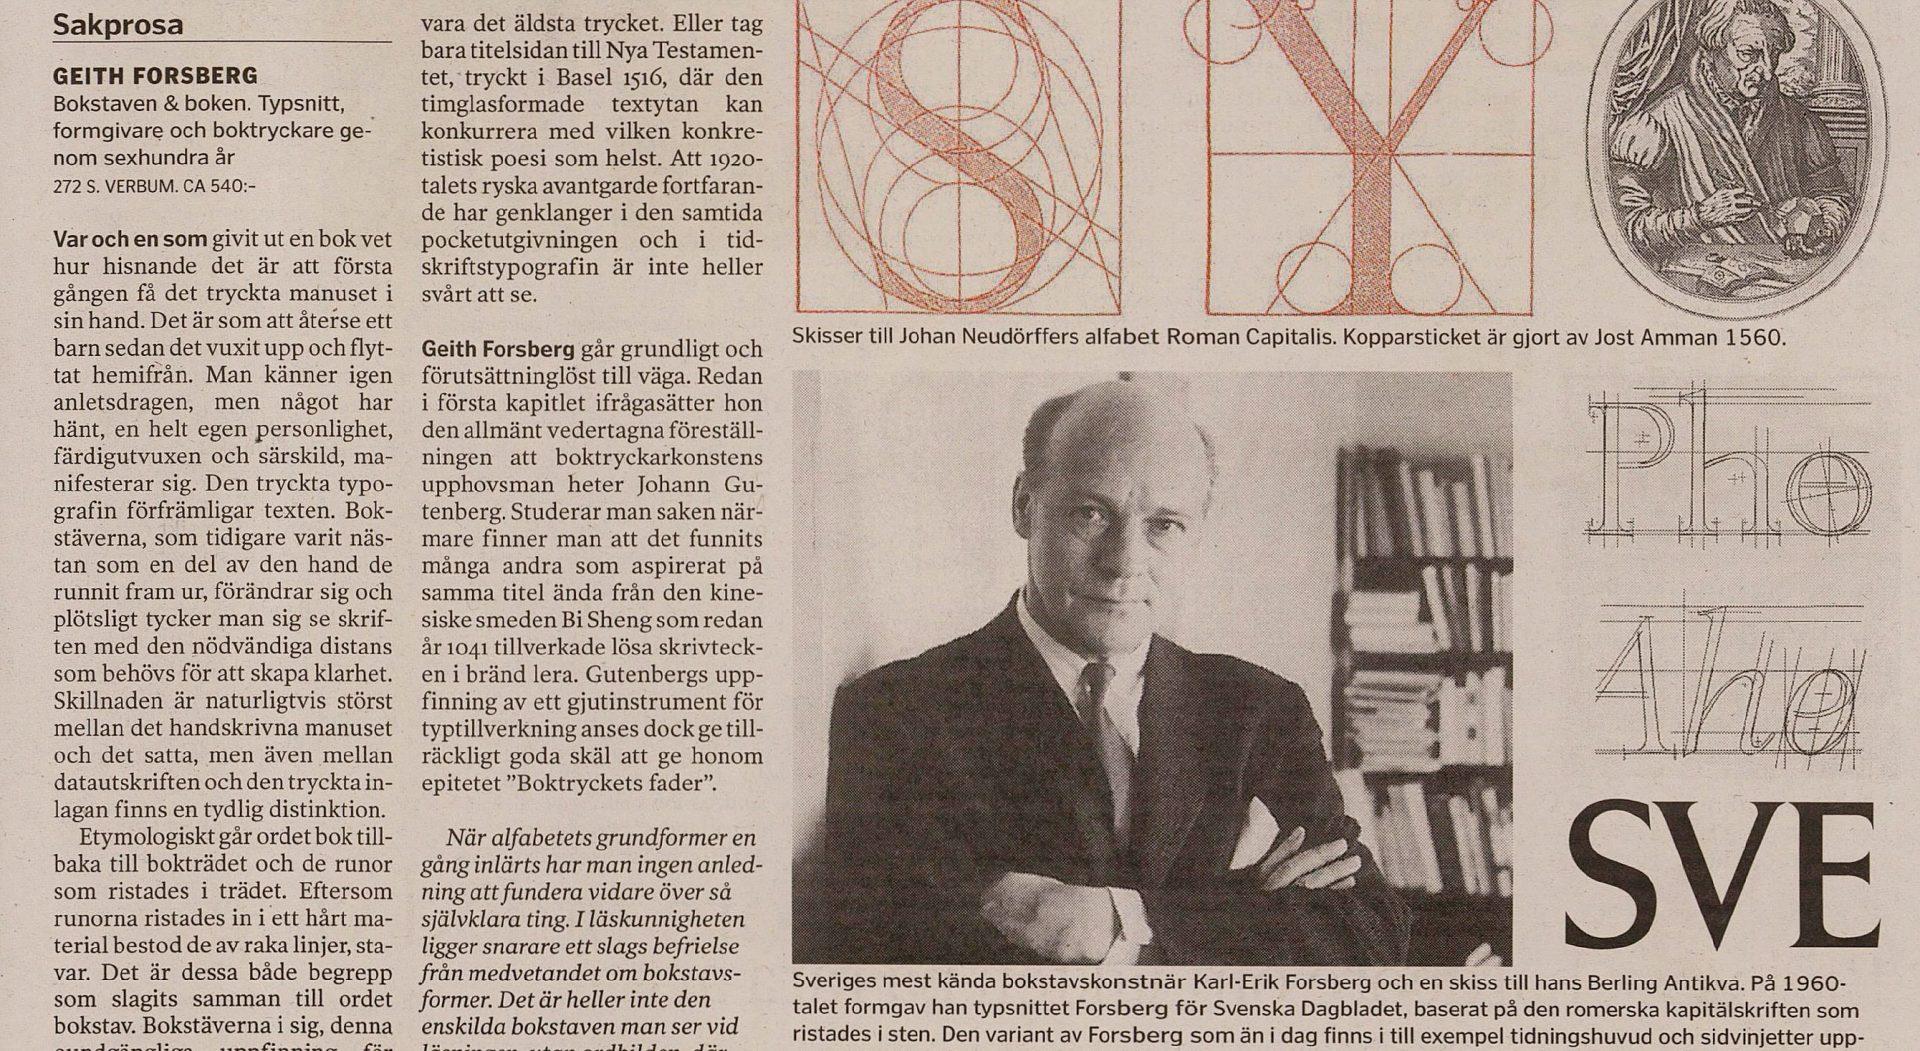 Karl-Erik Forsberg, article in SvD.